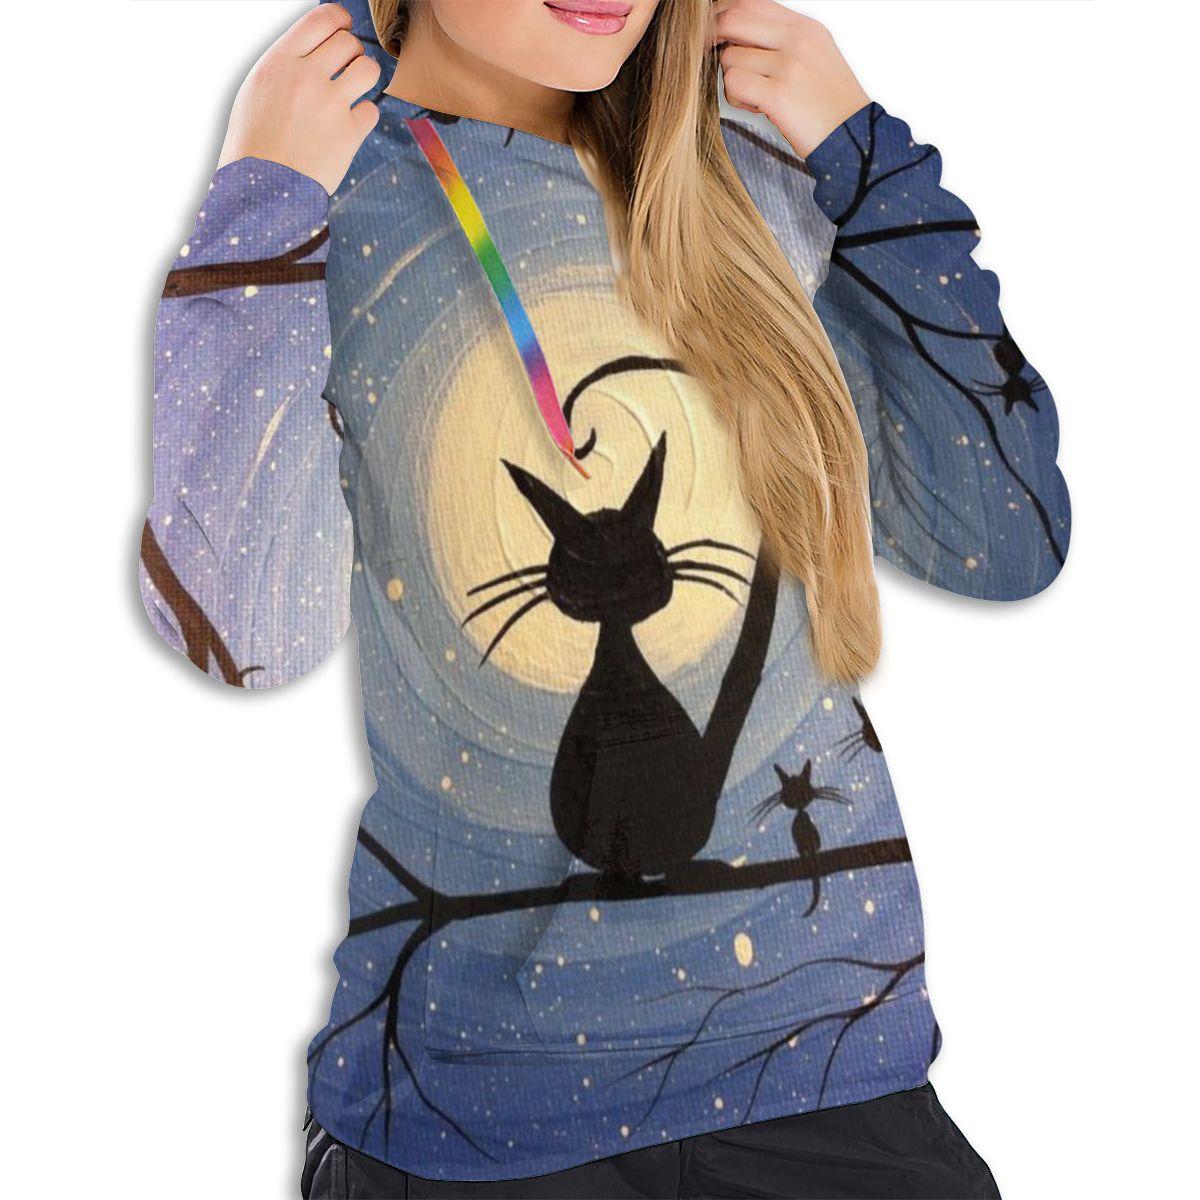 NOISYDESIGNS Fashion Women Casual Simple Sweatshirt Starry Cat Print Hoodie Long Sleeve Comfortable Soft Sweatshirt Blouse New